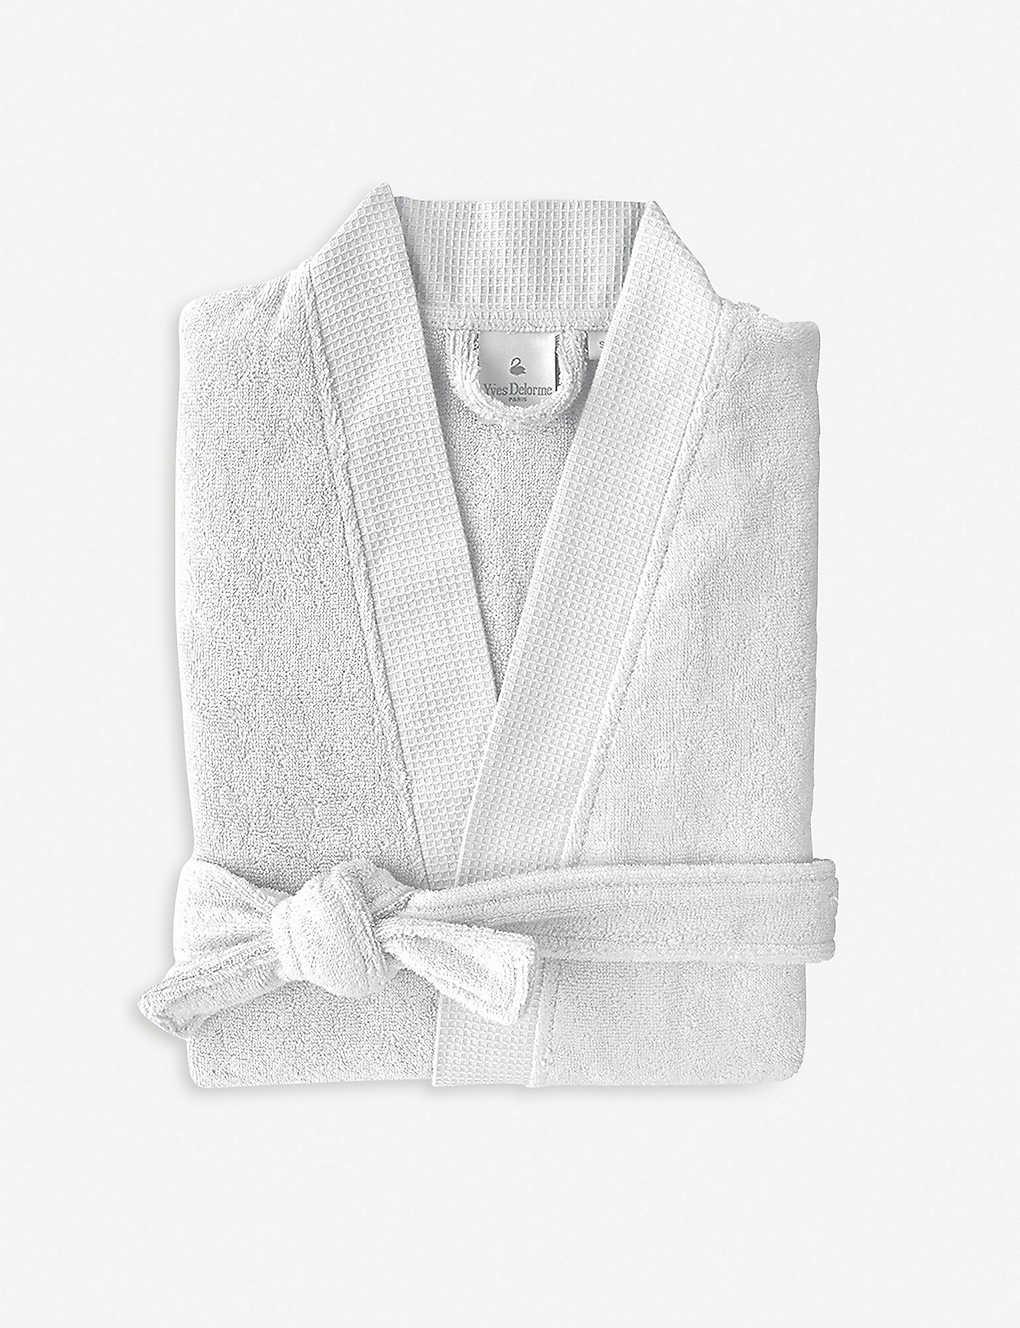 YVES DELORME - Silver cotton-blend bathrobe  bbf630d89